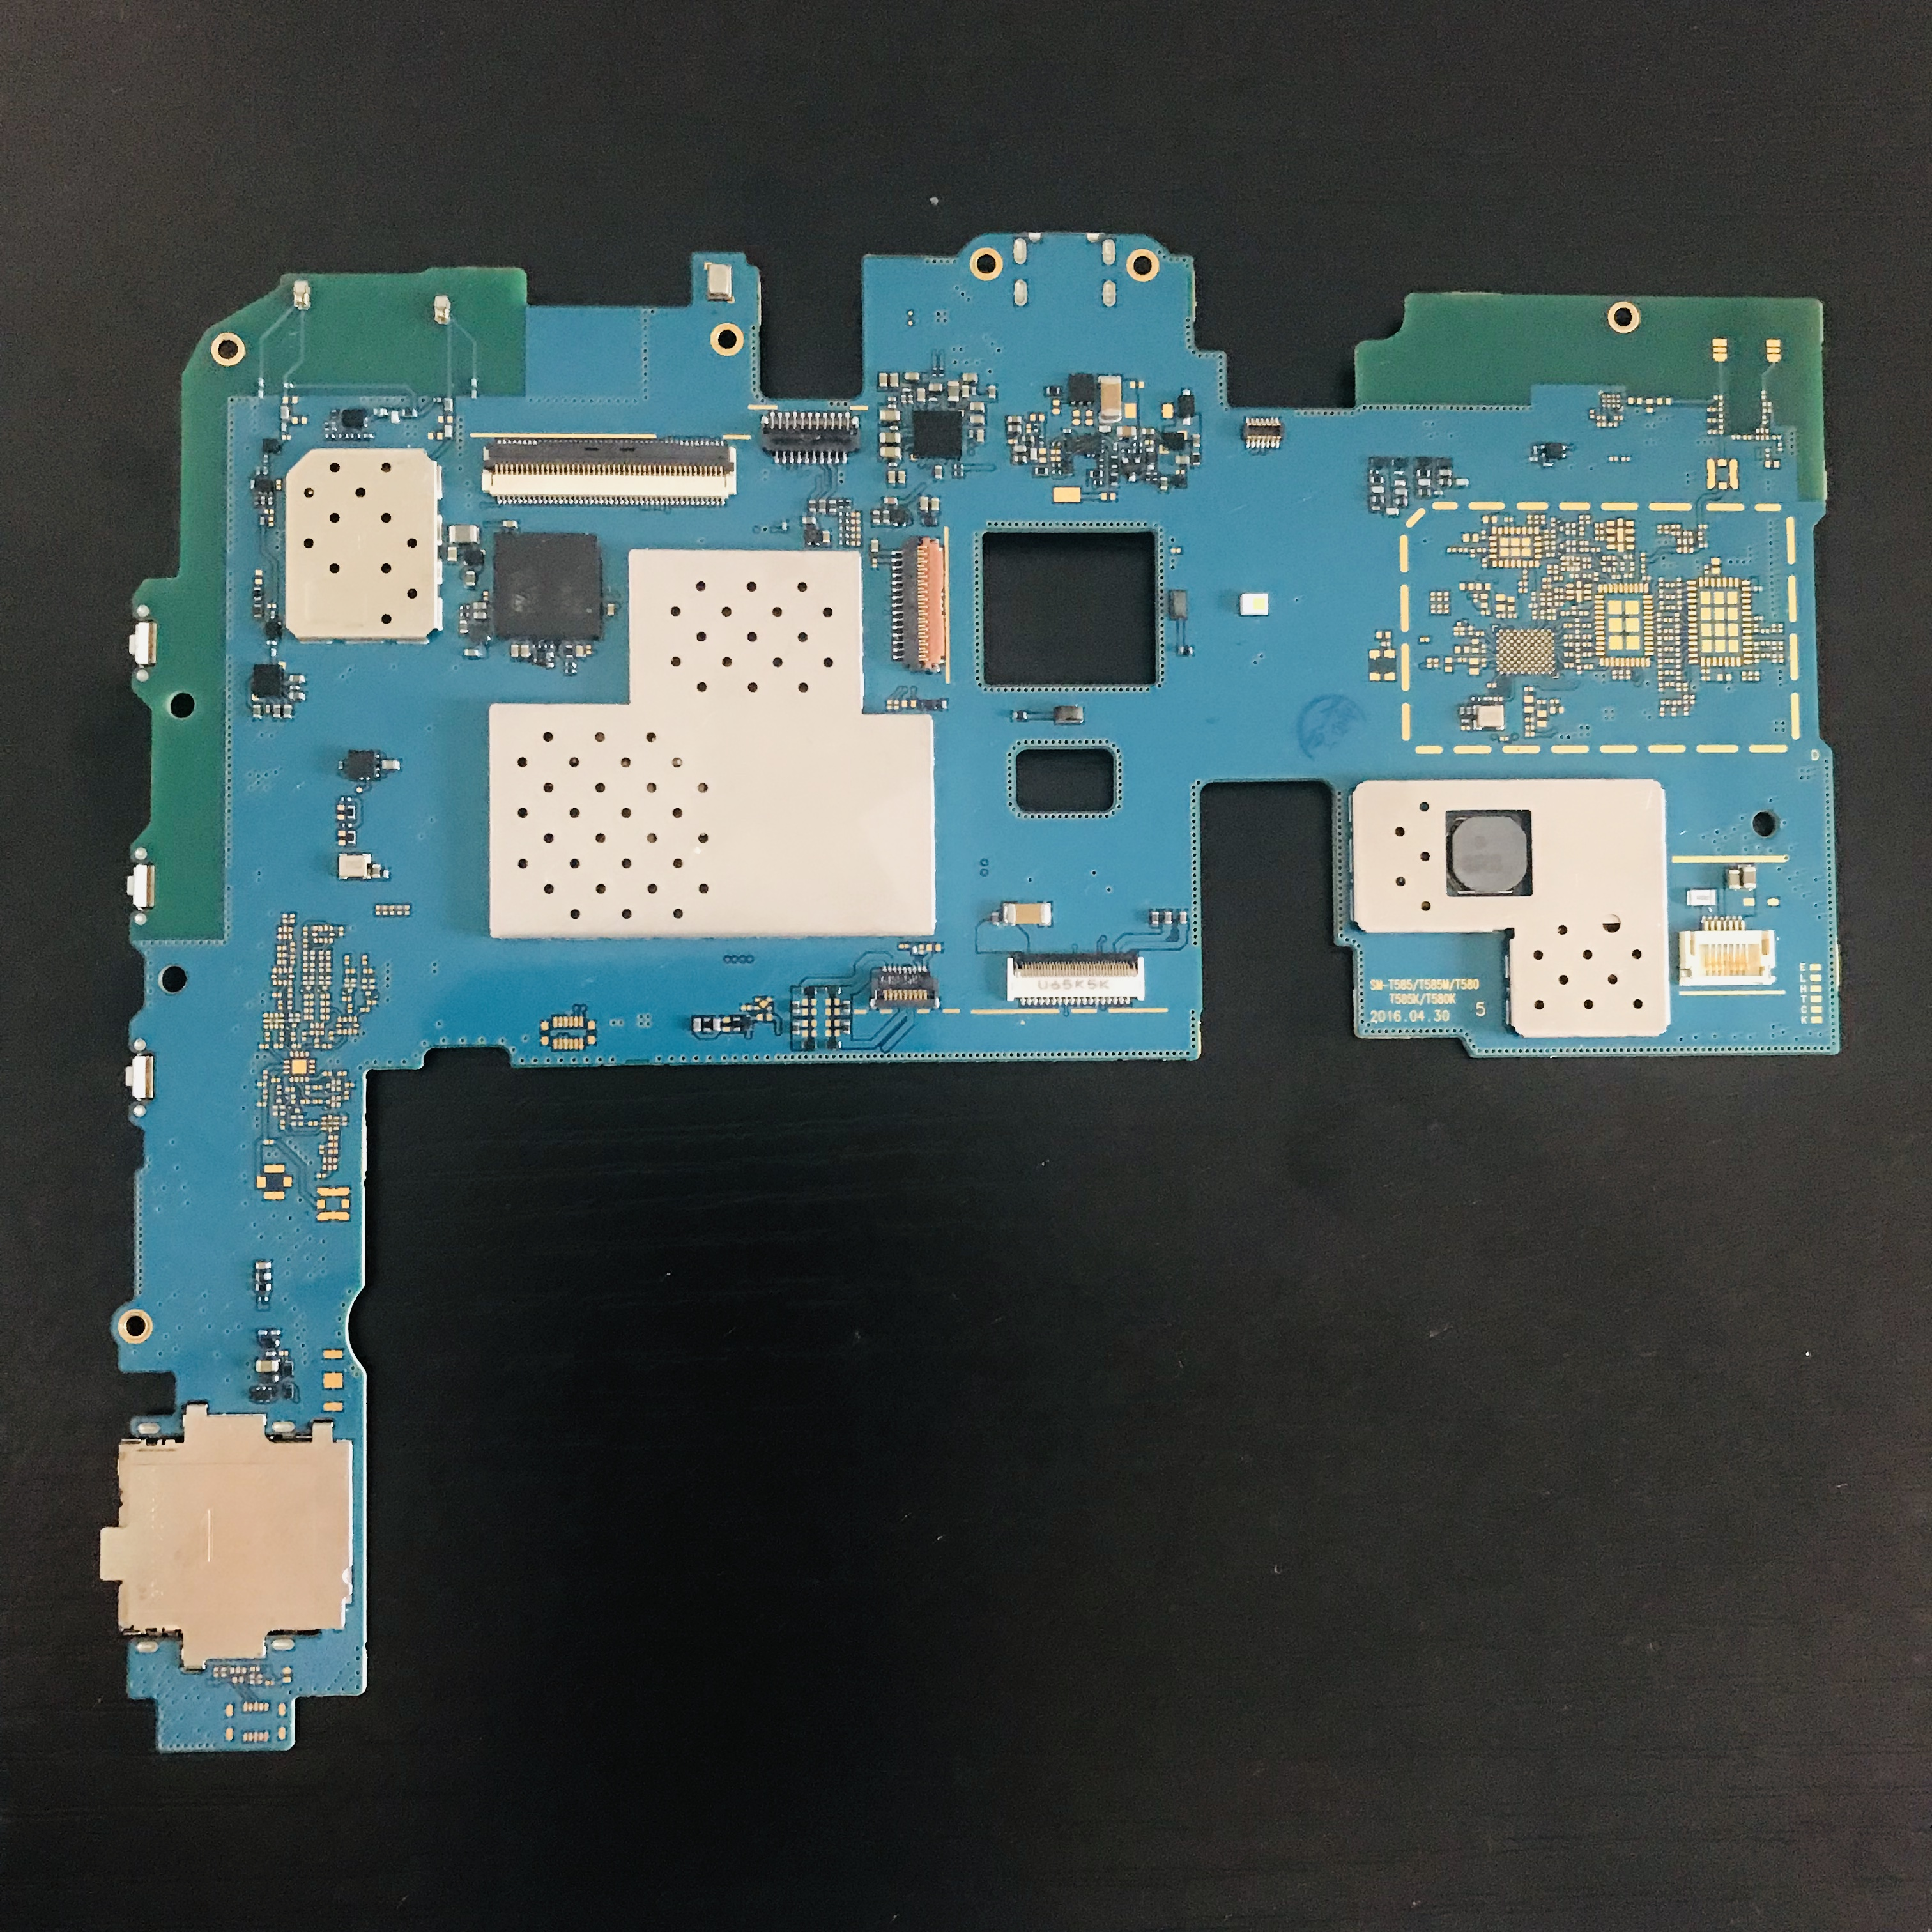 For Samsung Galaxy Tab A SM-T580 SM-T585 T580 T585 16GB Motherboard Mainboard Logic Board Circuits Card Fee Flex Cable